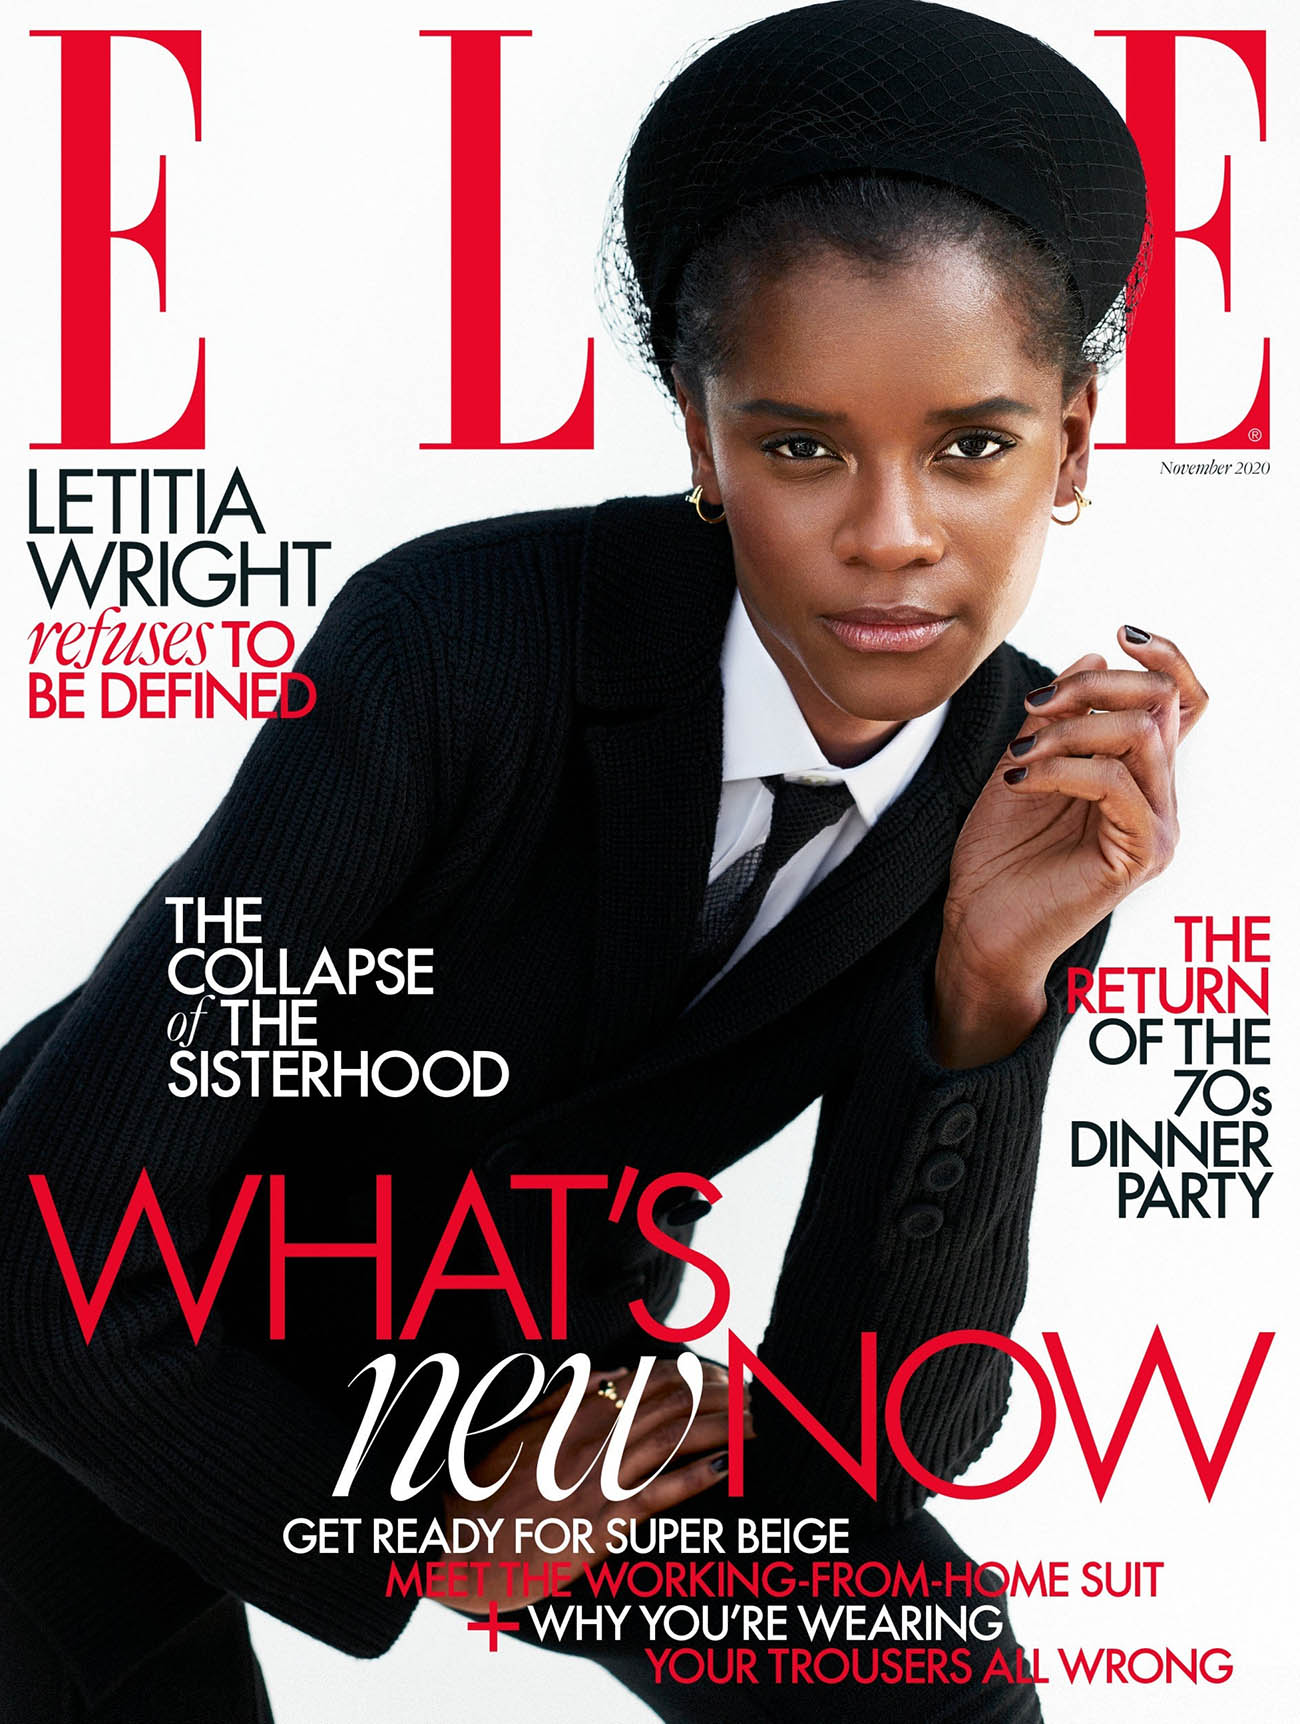 Letitia-Wright-covers-Elle-UK-November-2020-by-Marcin-Kempski-1